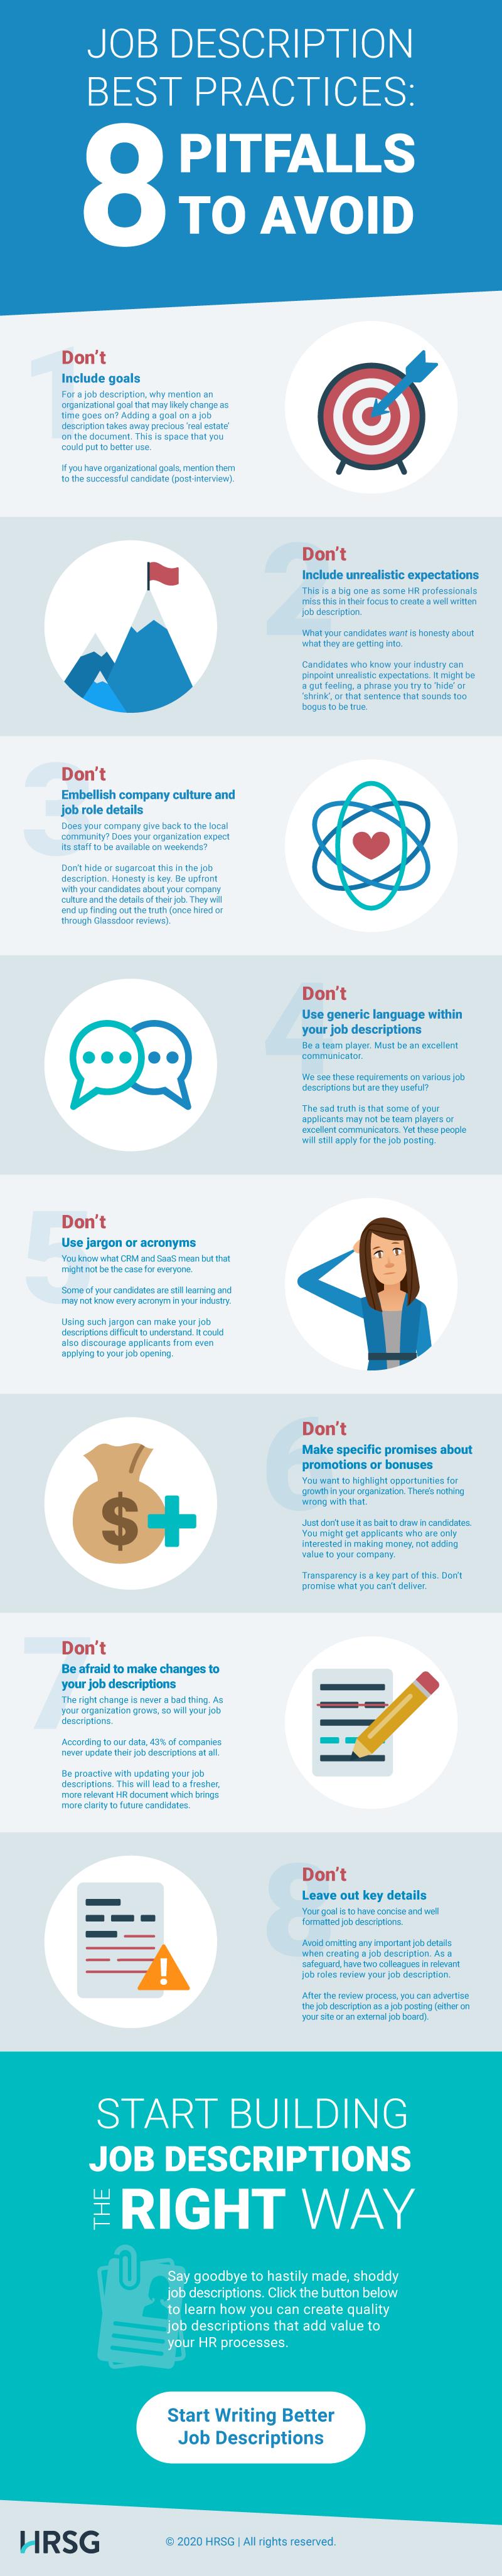 8 job description mistakes to avoid